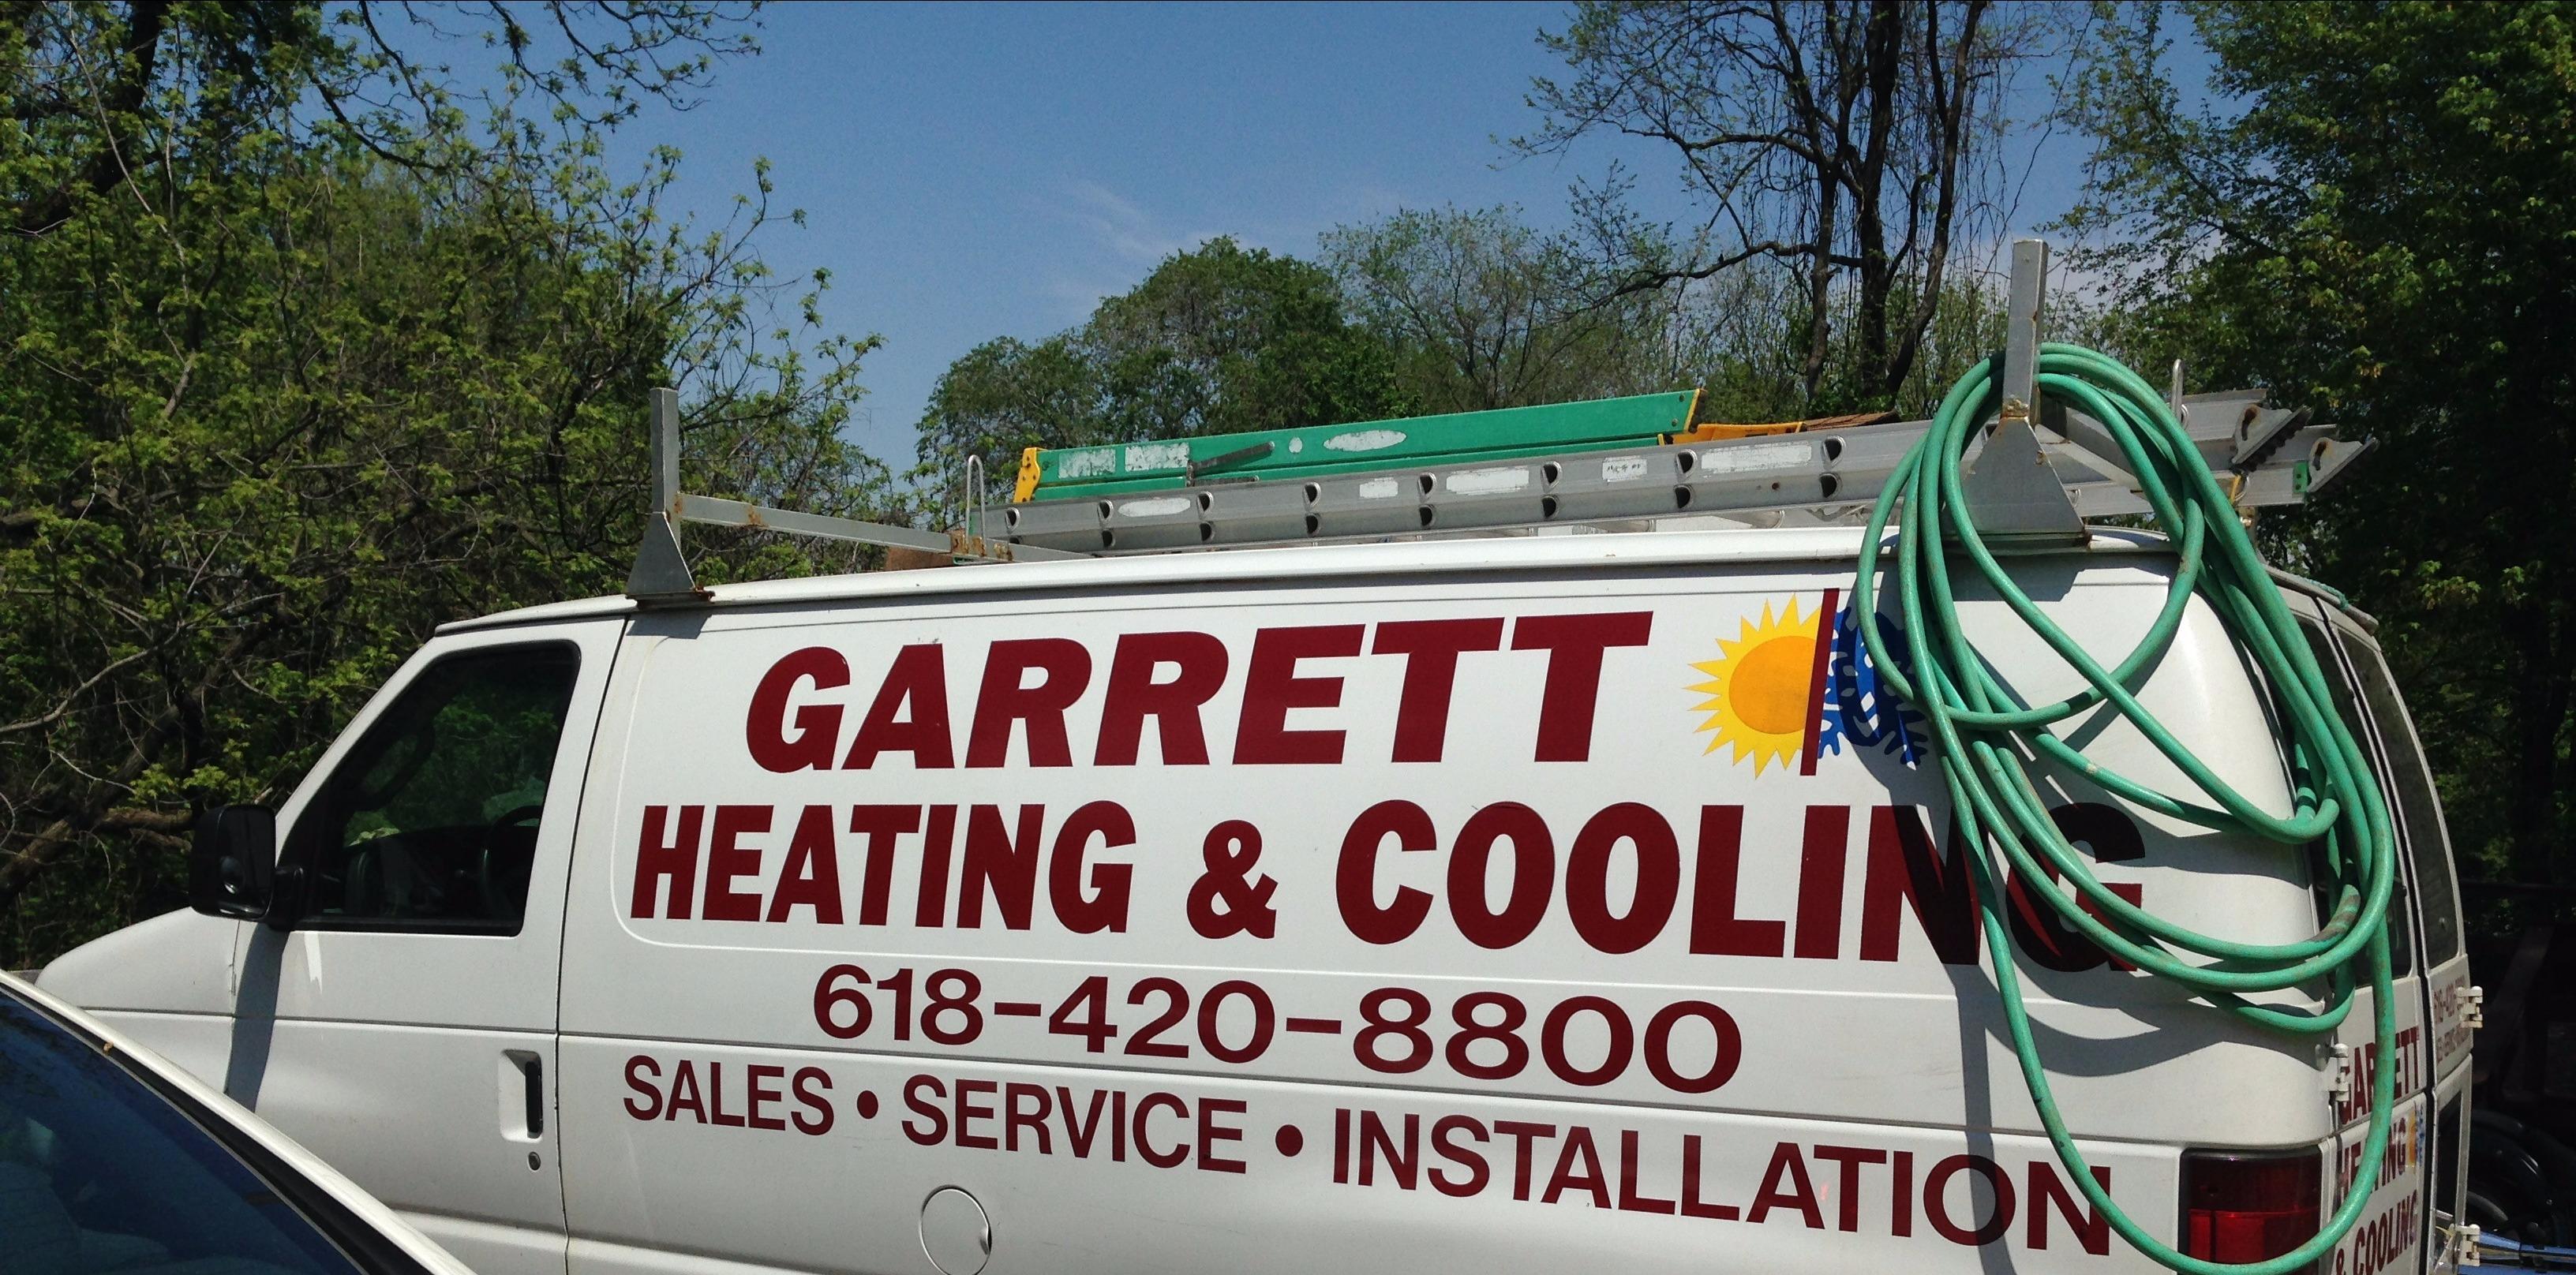 Garrett Heating & Cooling image 3